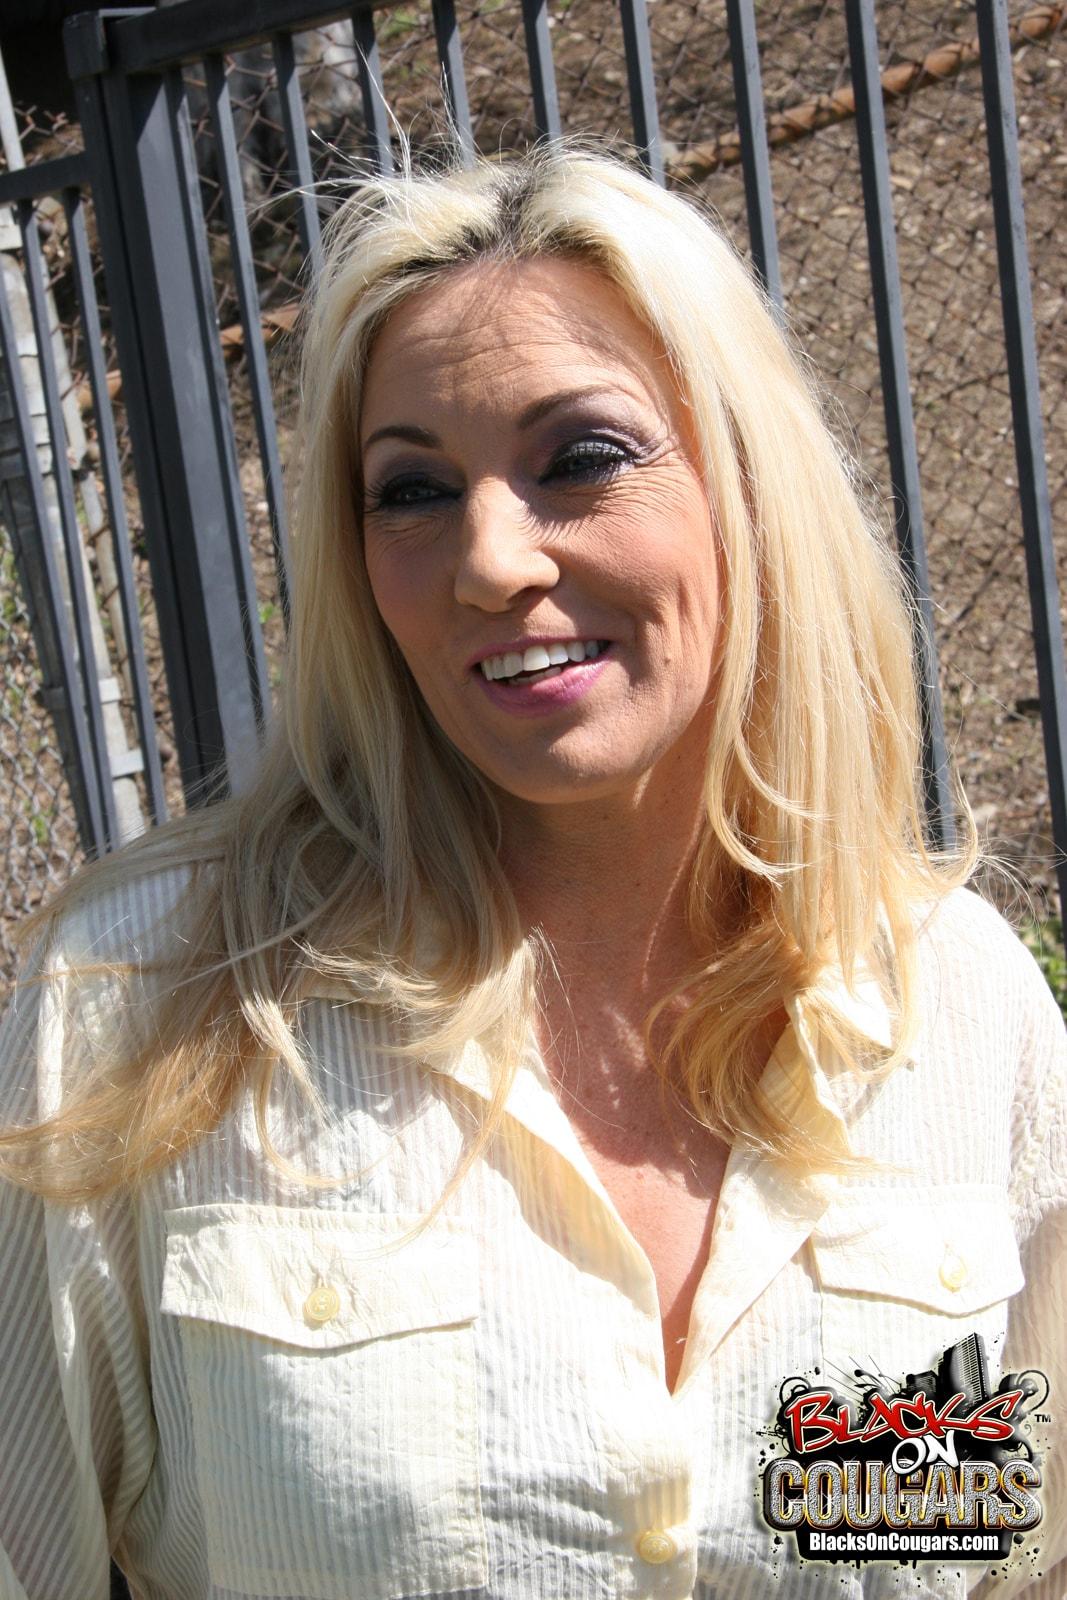 Dogfart '- Blacks On Cougars' starring Cala Craves (Photo 2)